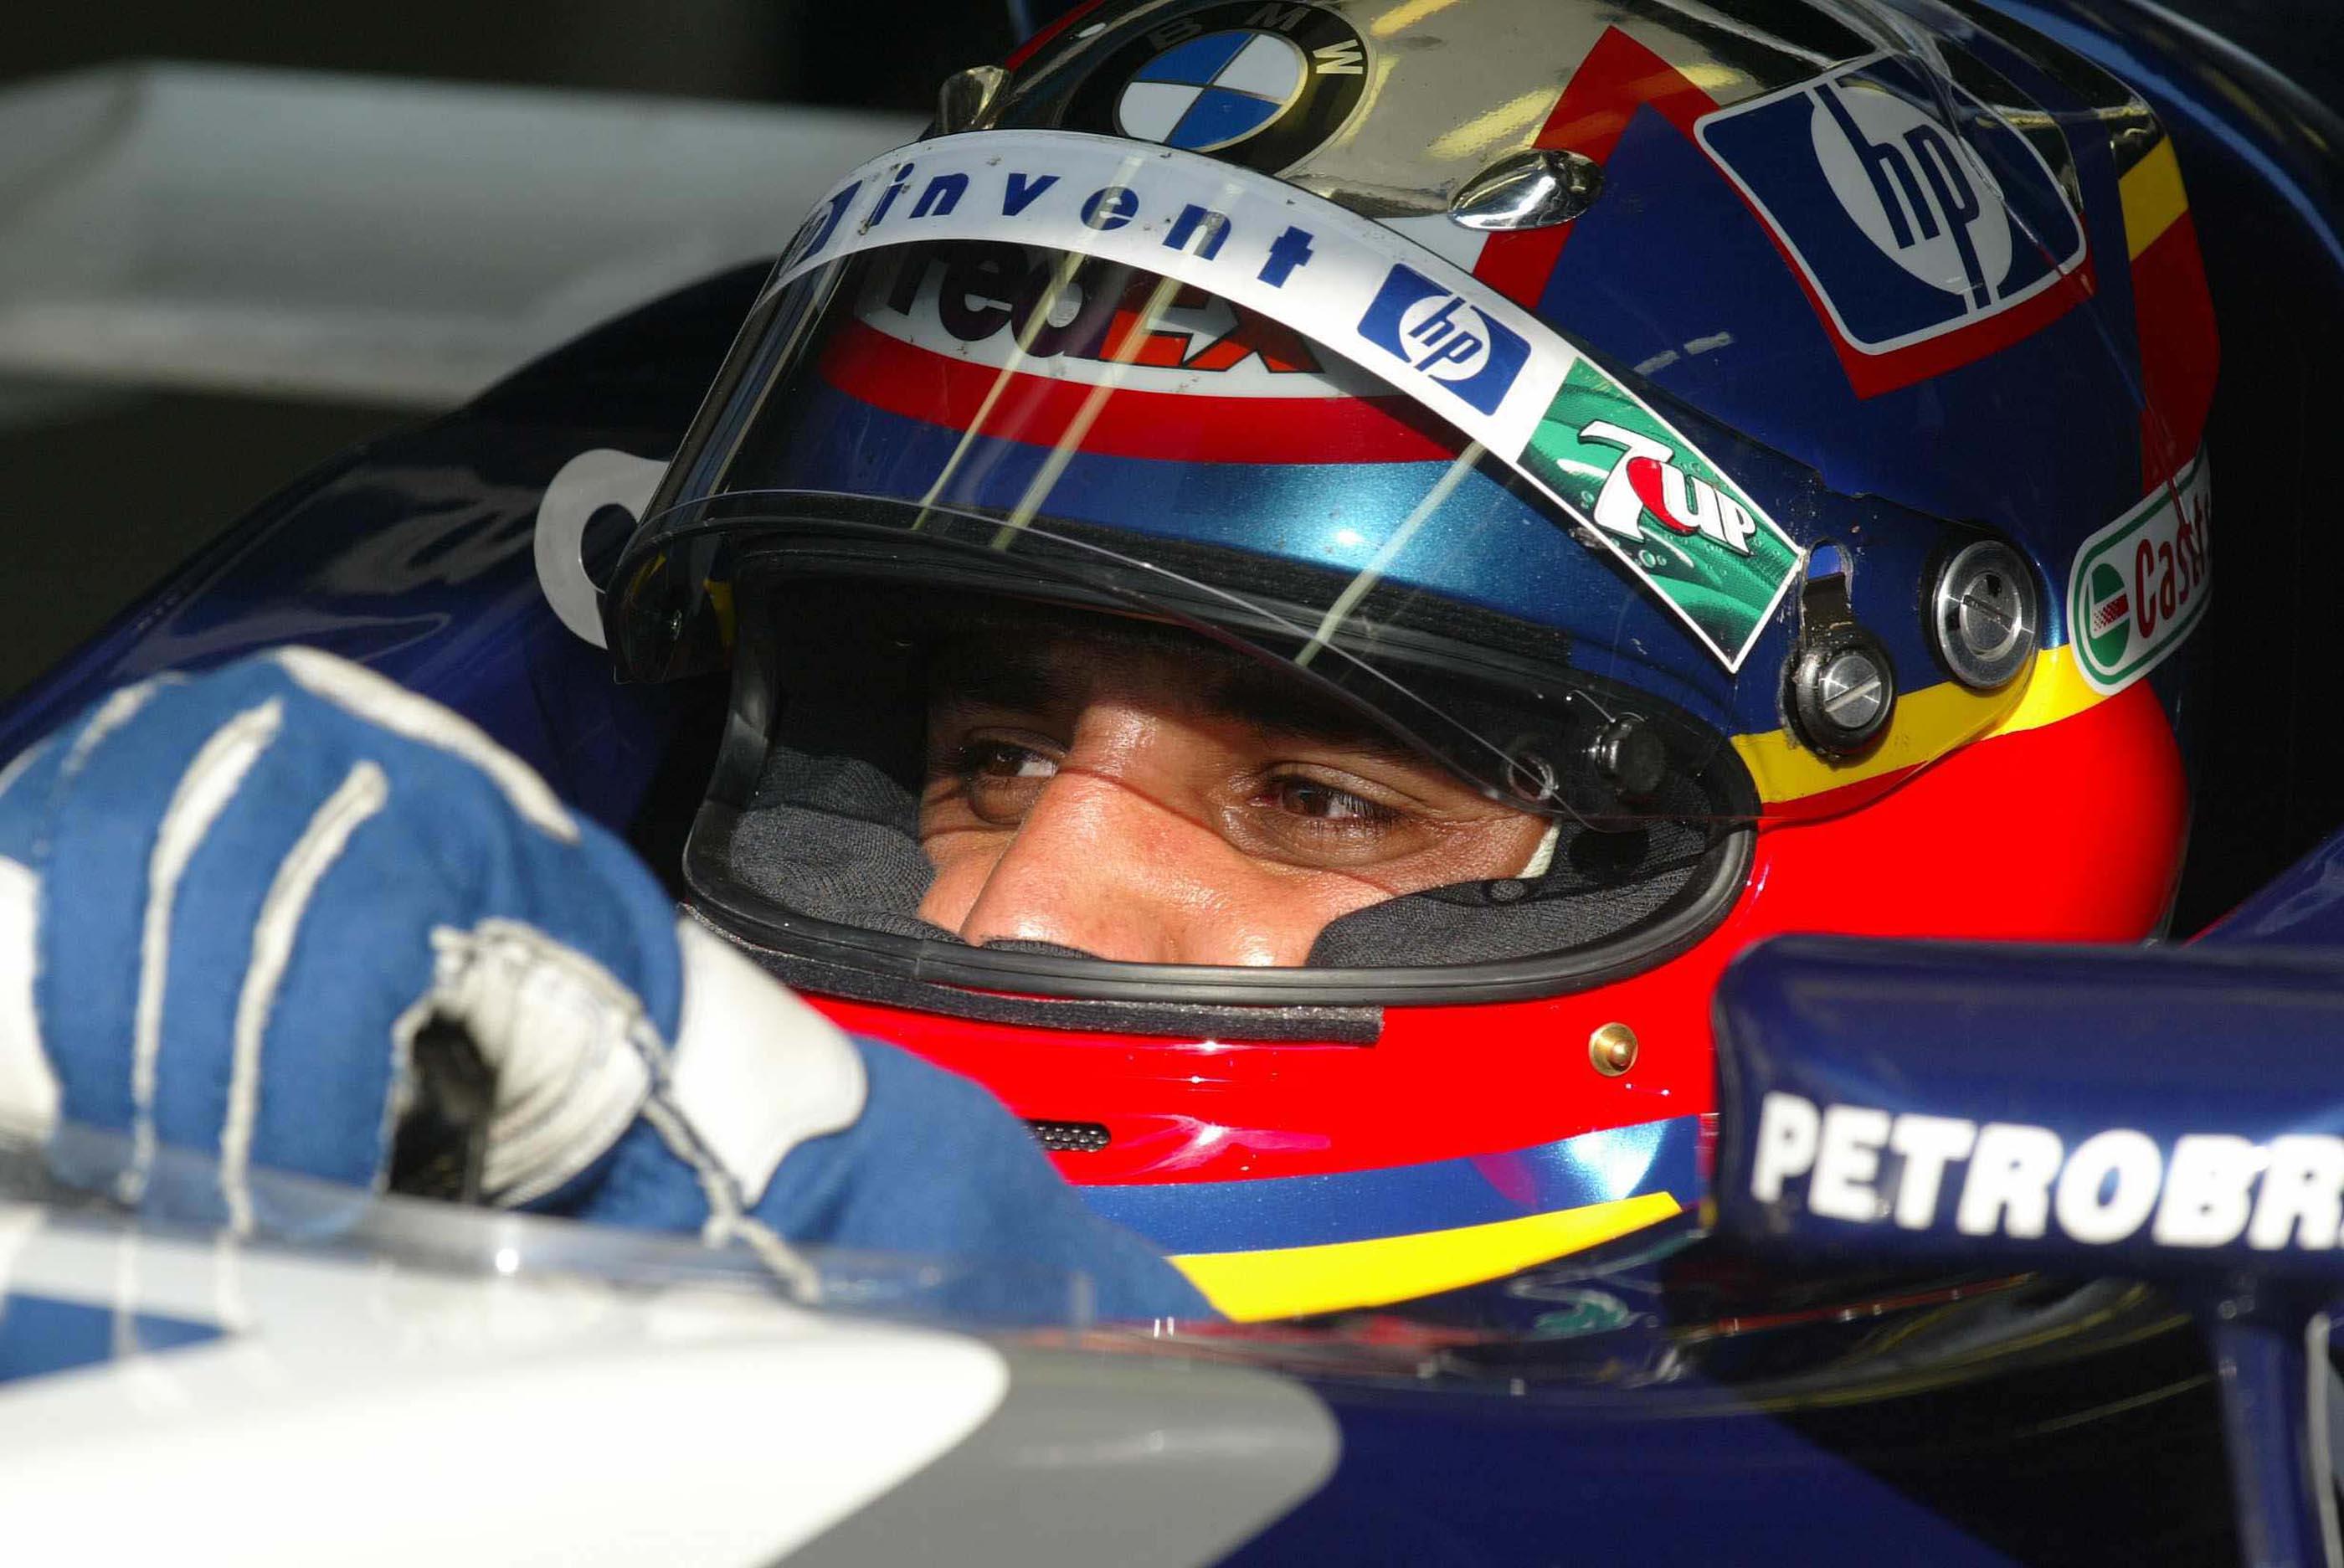 F1 Test In Monza 2003......